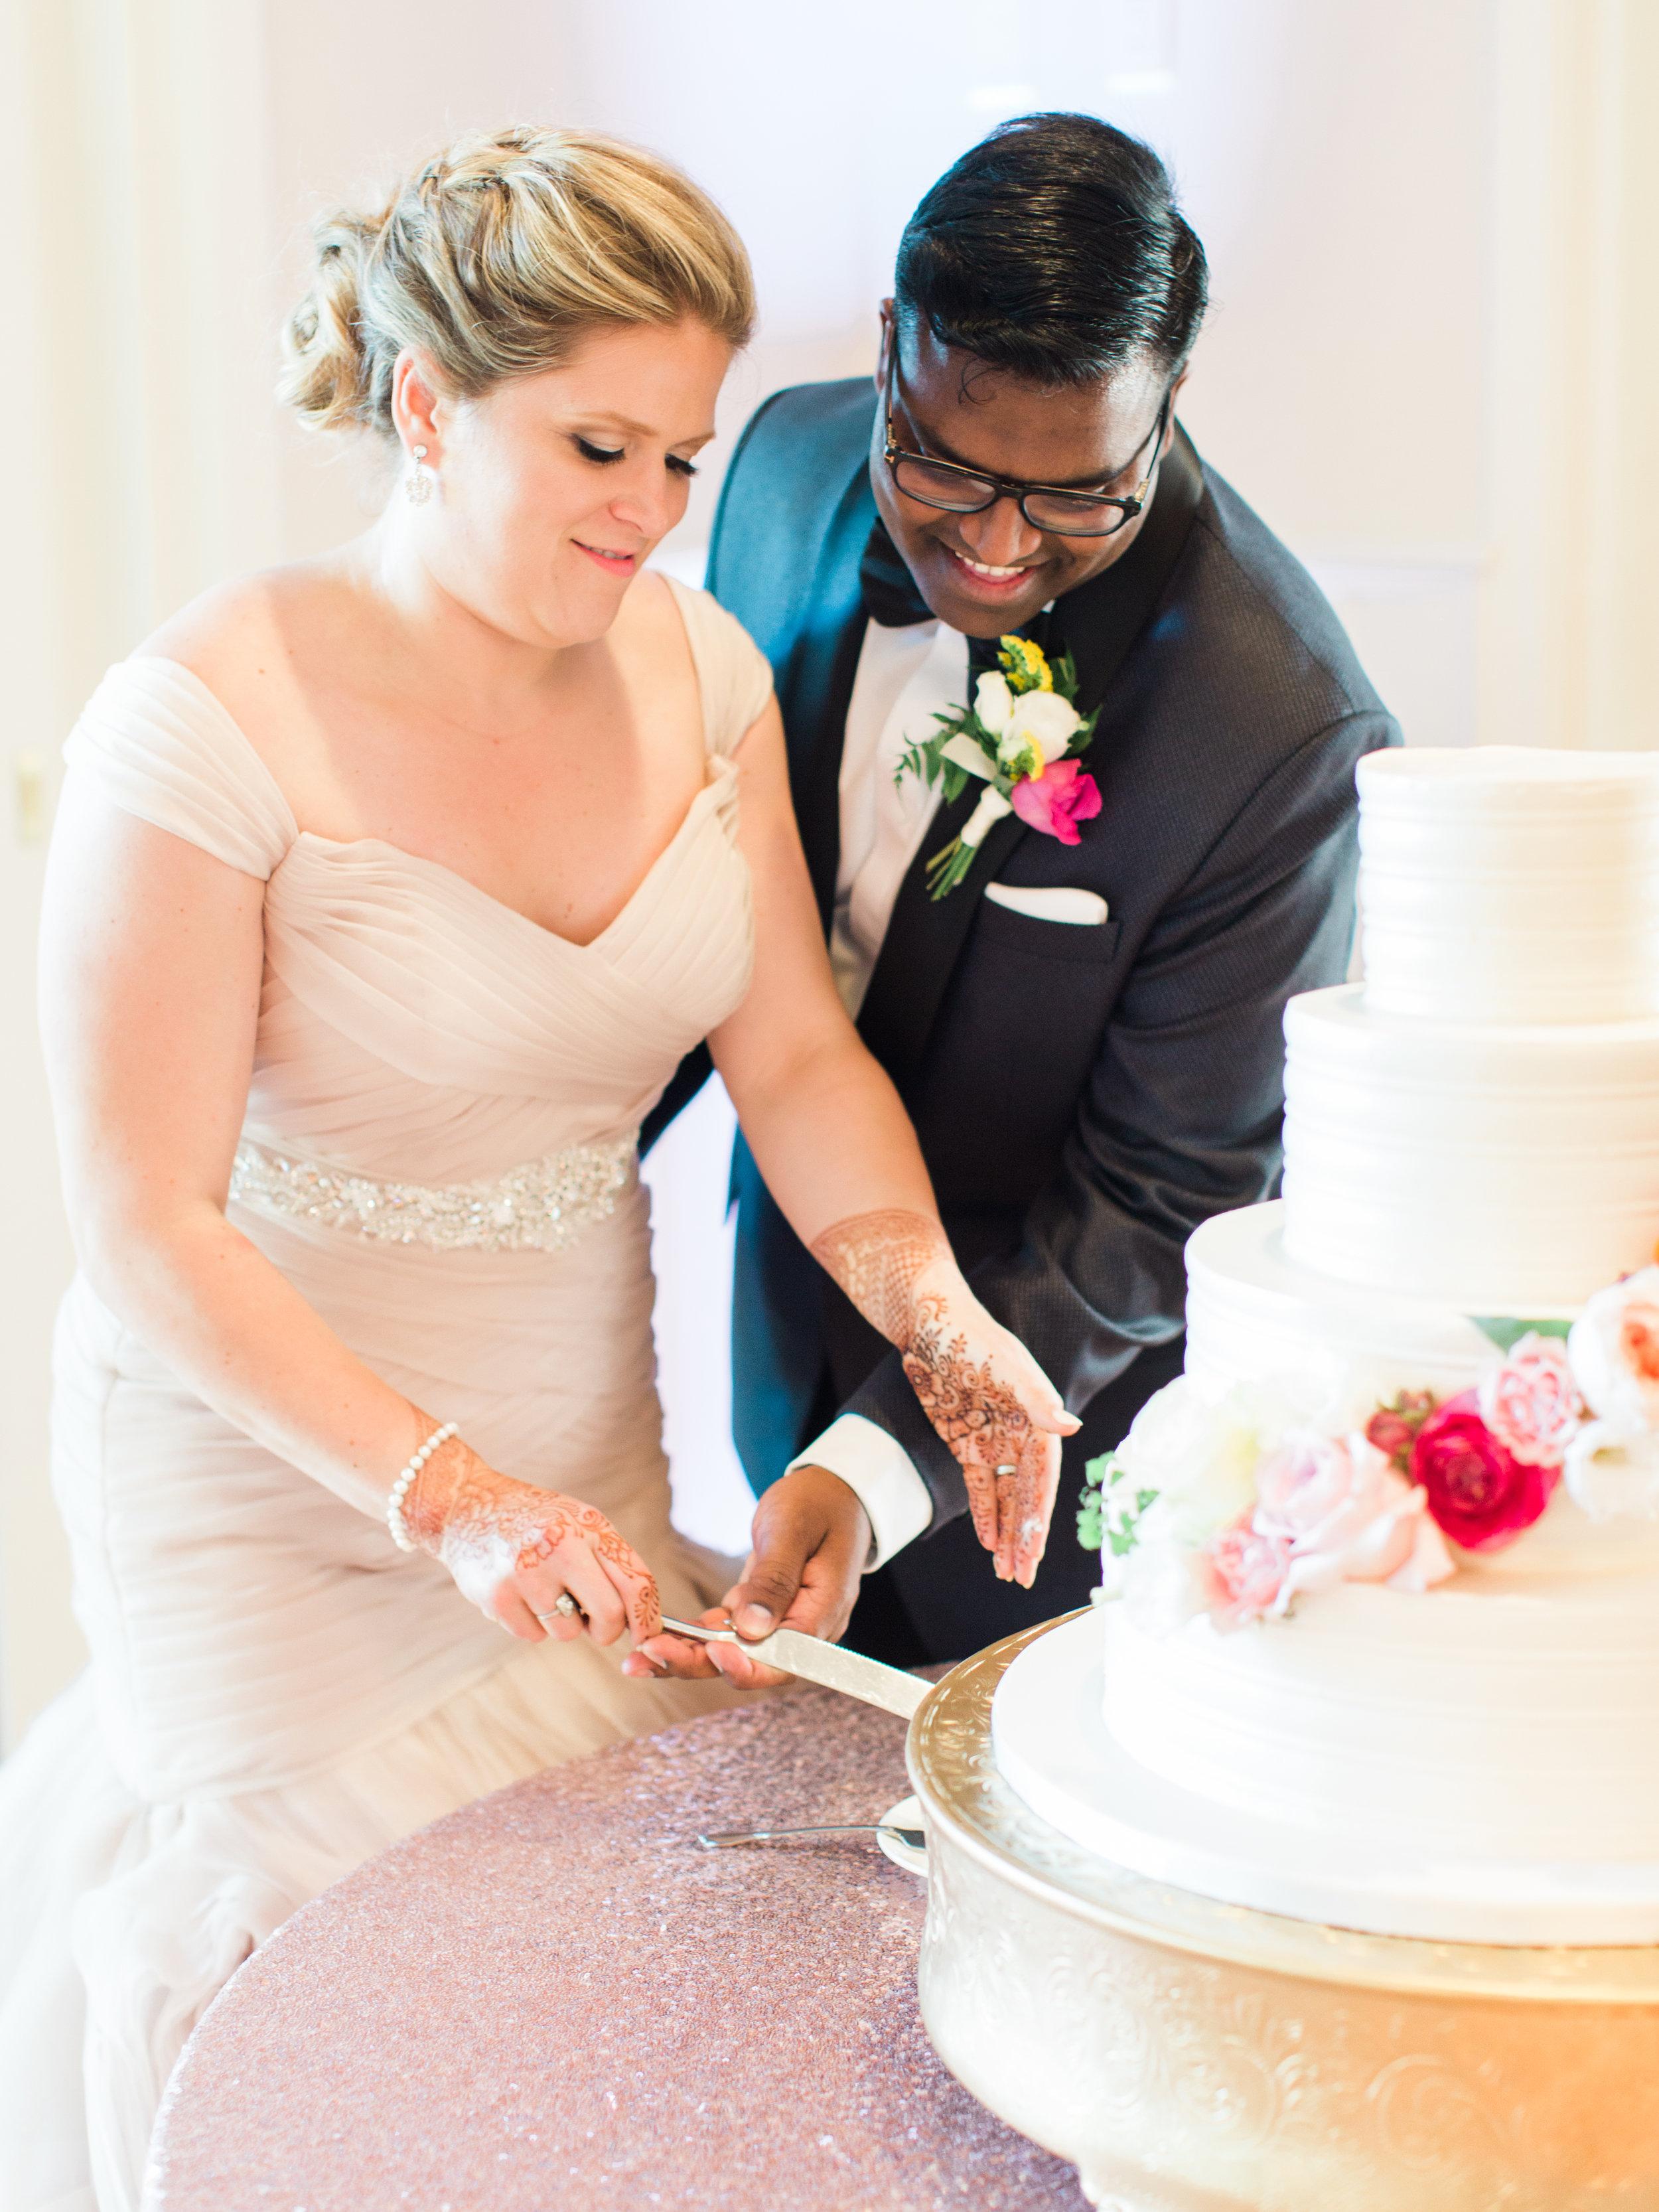 Govathoti+Wedding+Reception+Cake+Cutting-9.jpg